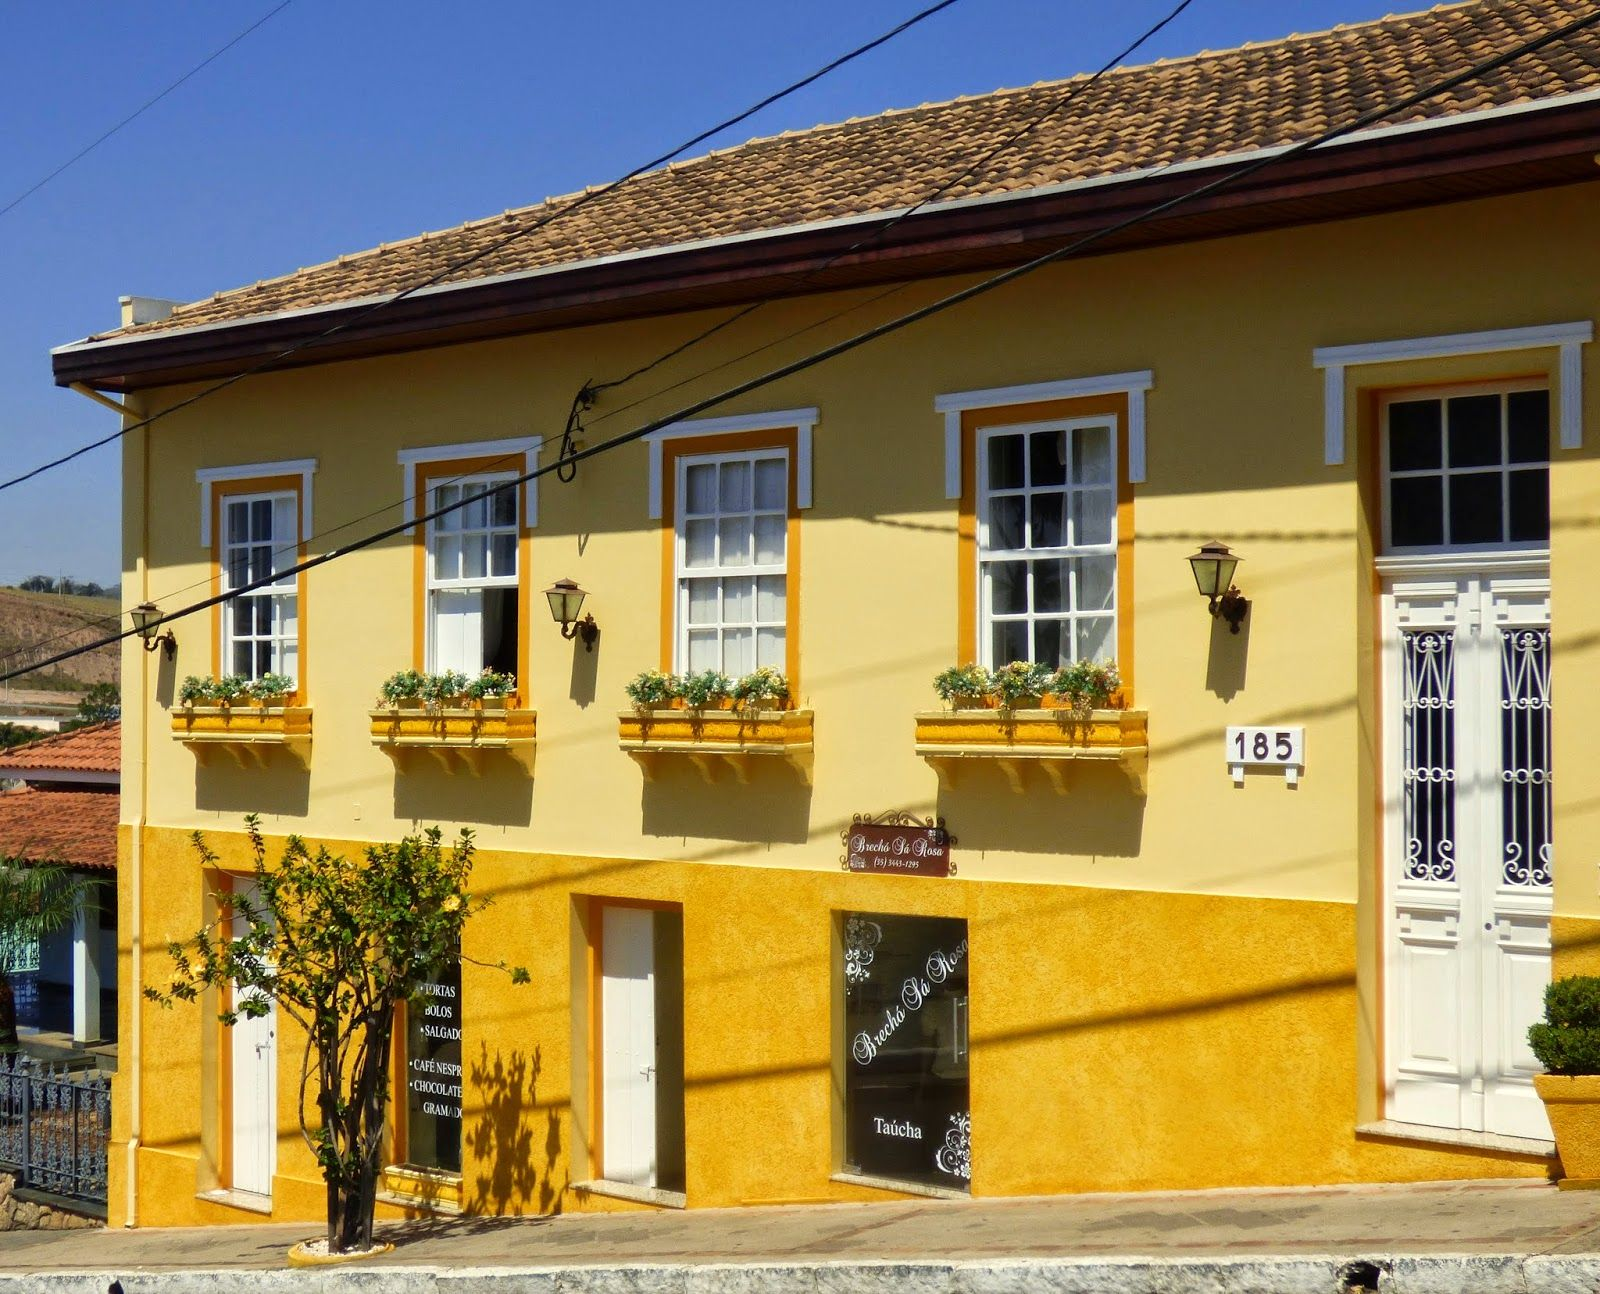 Fachadas casas pintadas de amarelo pesquisa google fachada pinterest - Fachadas de casas pintadas ...